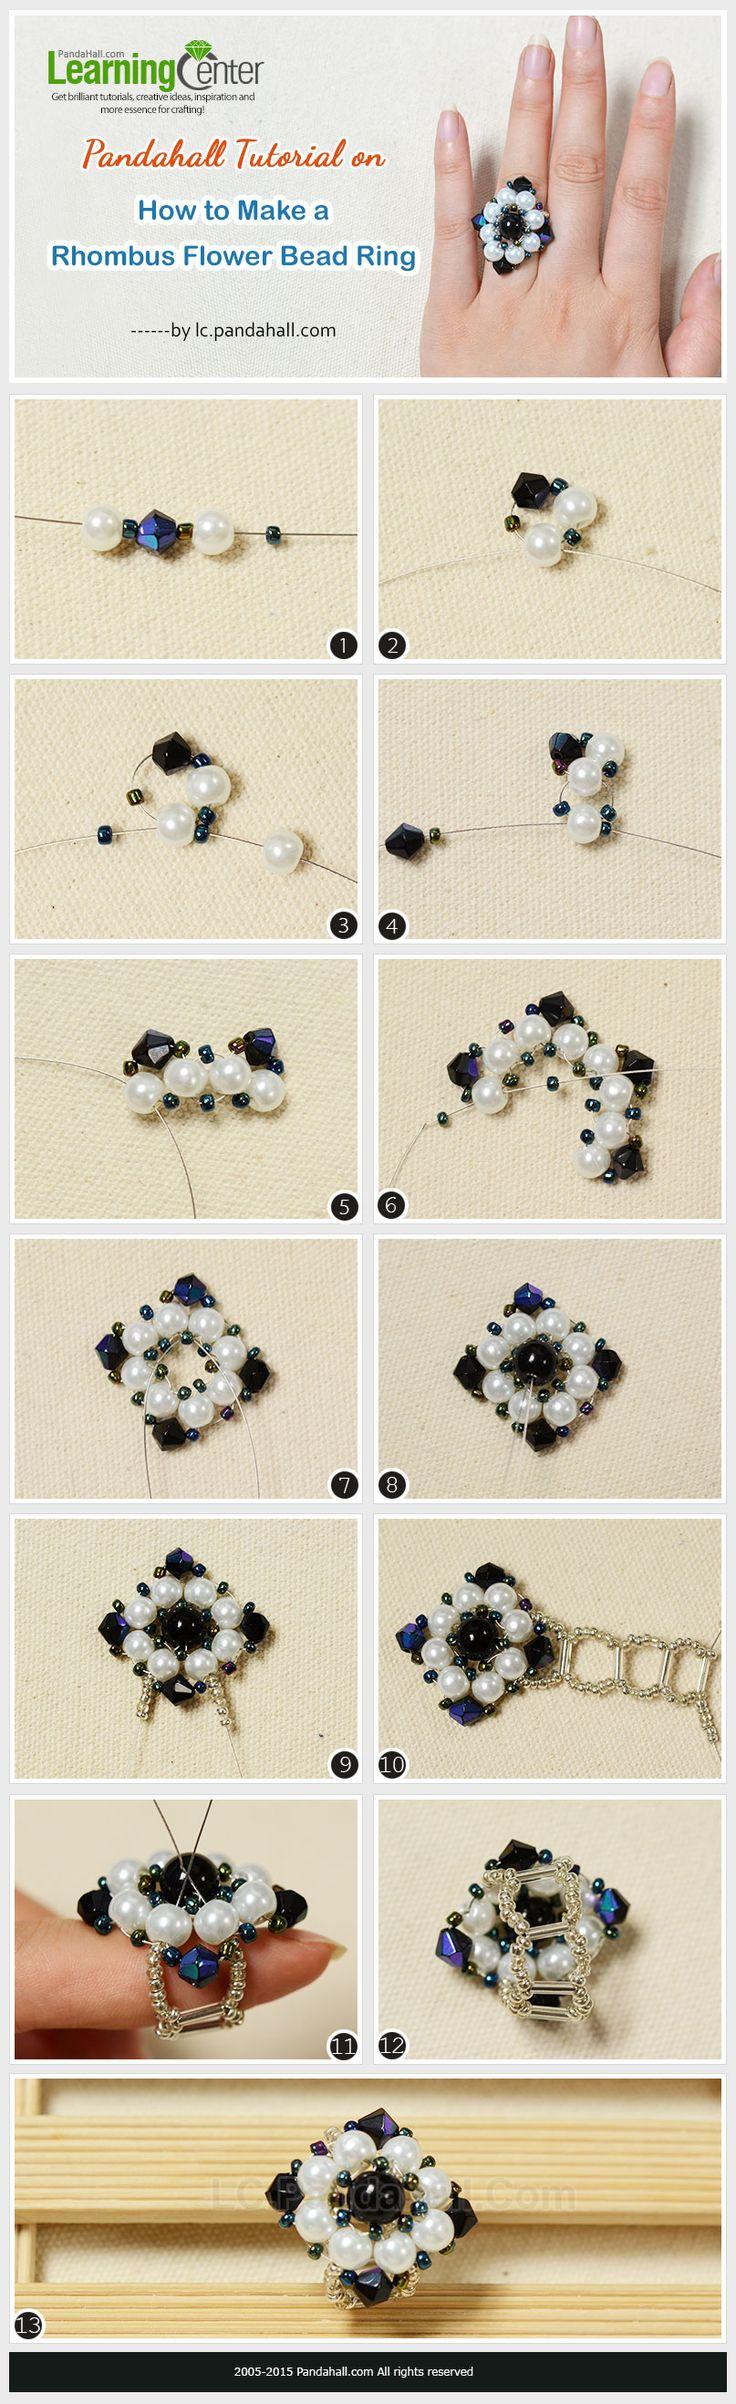 Pandahall-Tutorial-on-How-to-Make-a-Rhombus-Flower-Bead-Ring